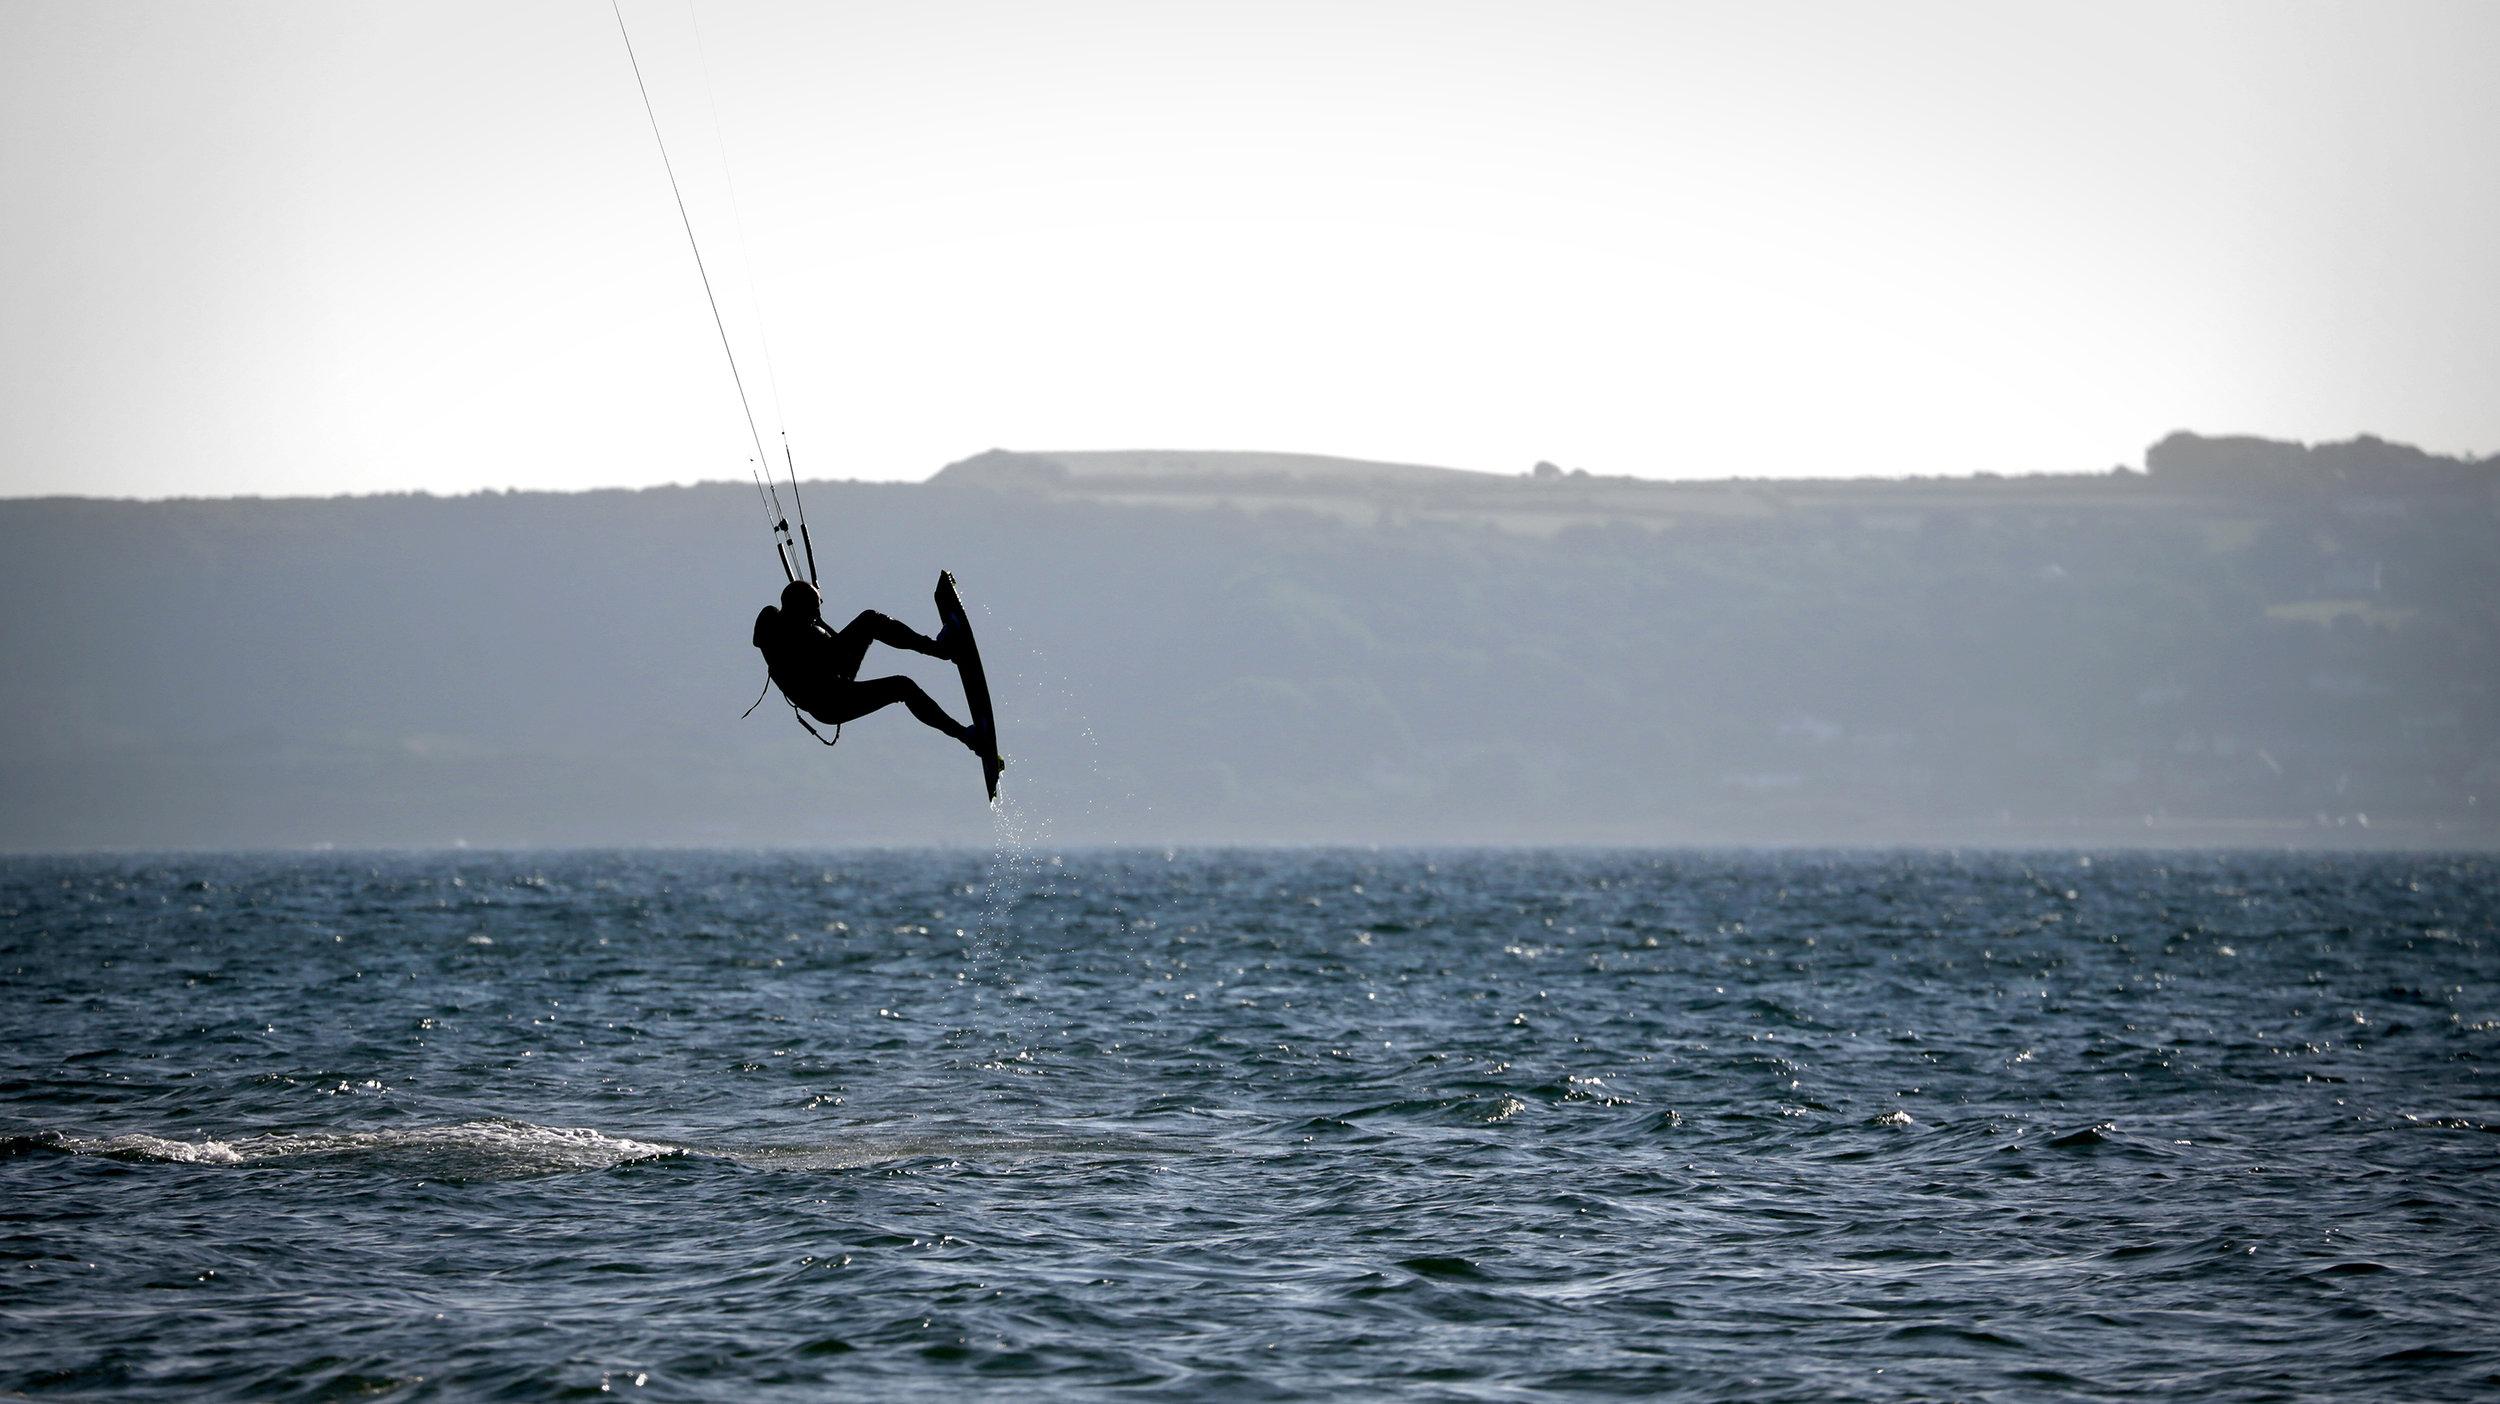 windsurf 2.jpeg